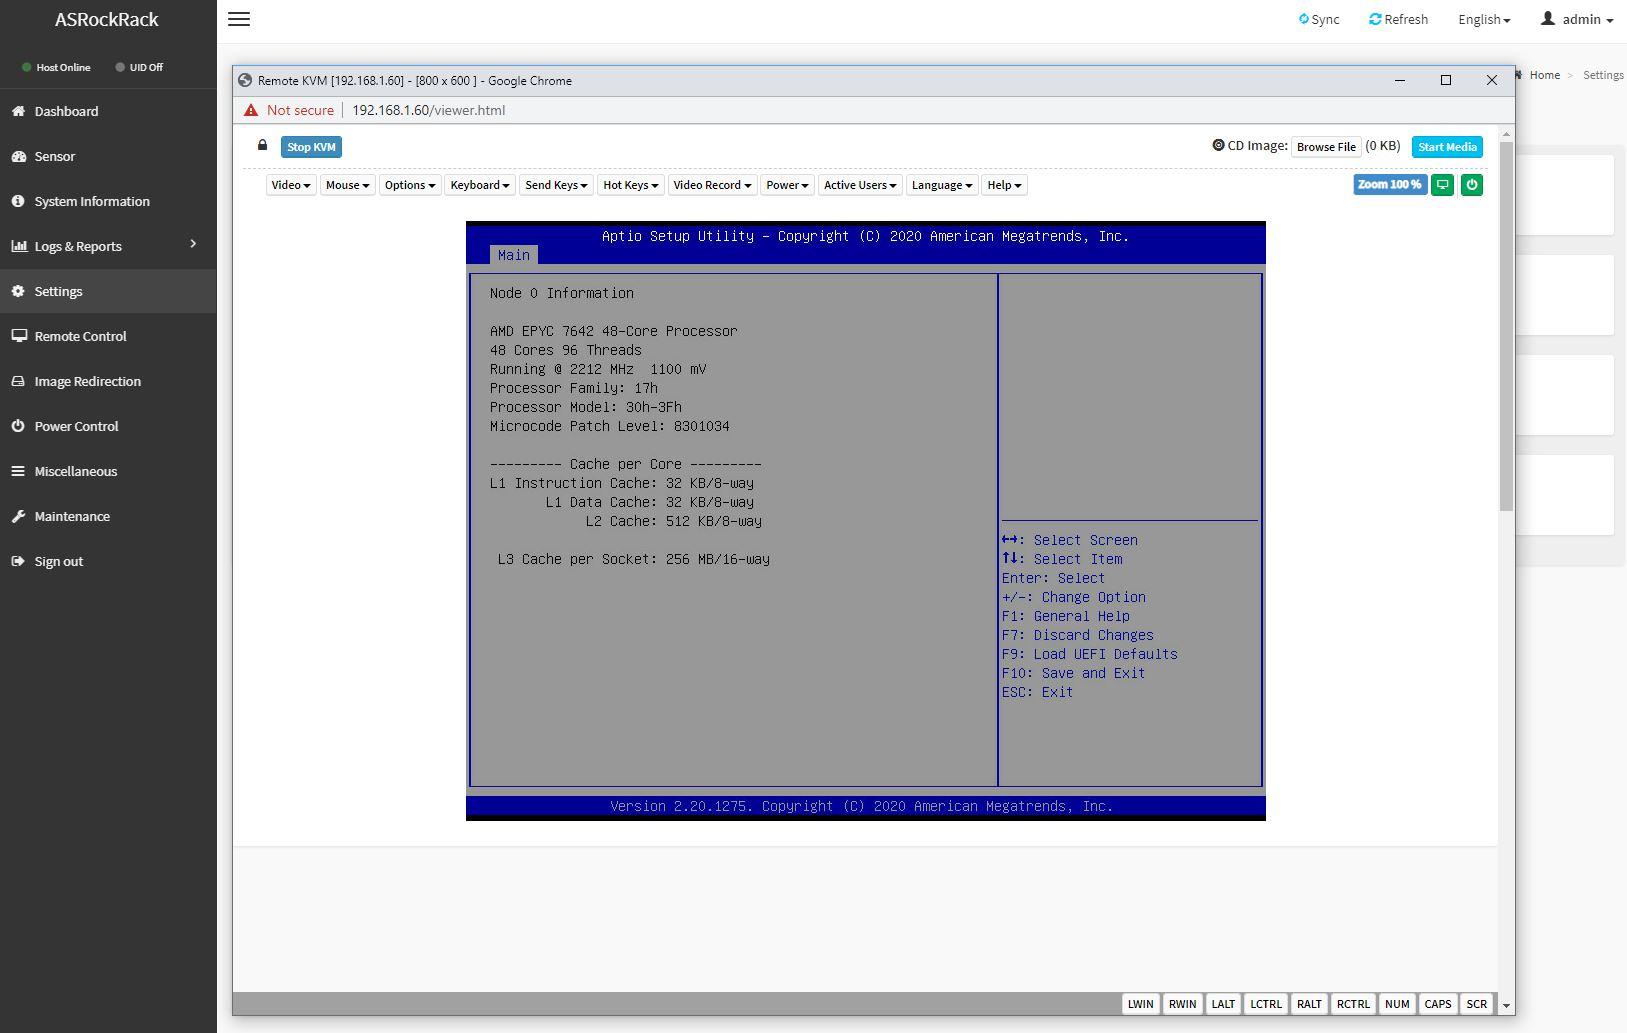 ASRock Rack ROMED8 2T IPMI HTML5 IKM BIOS